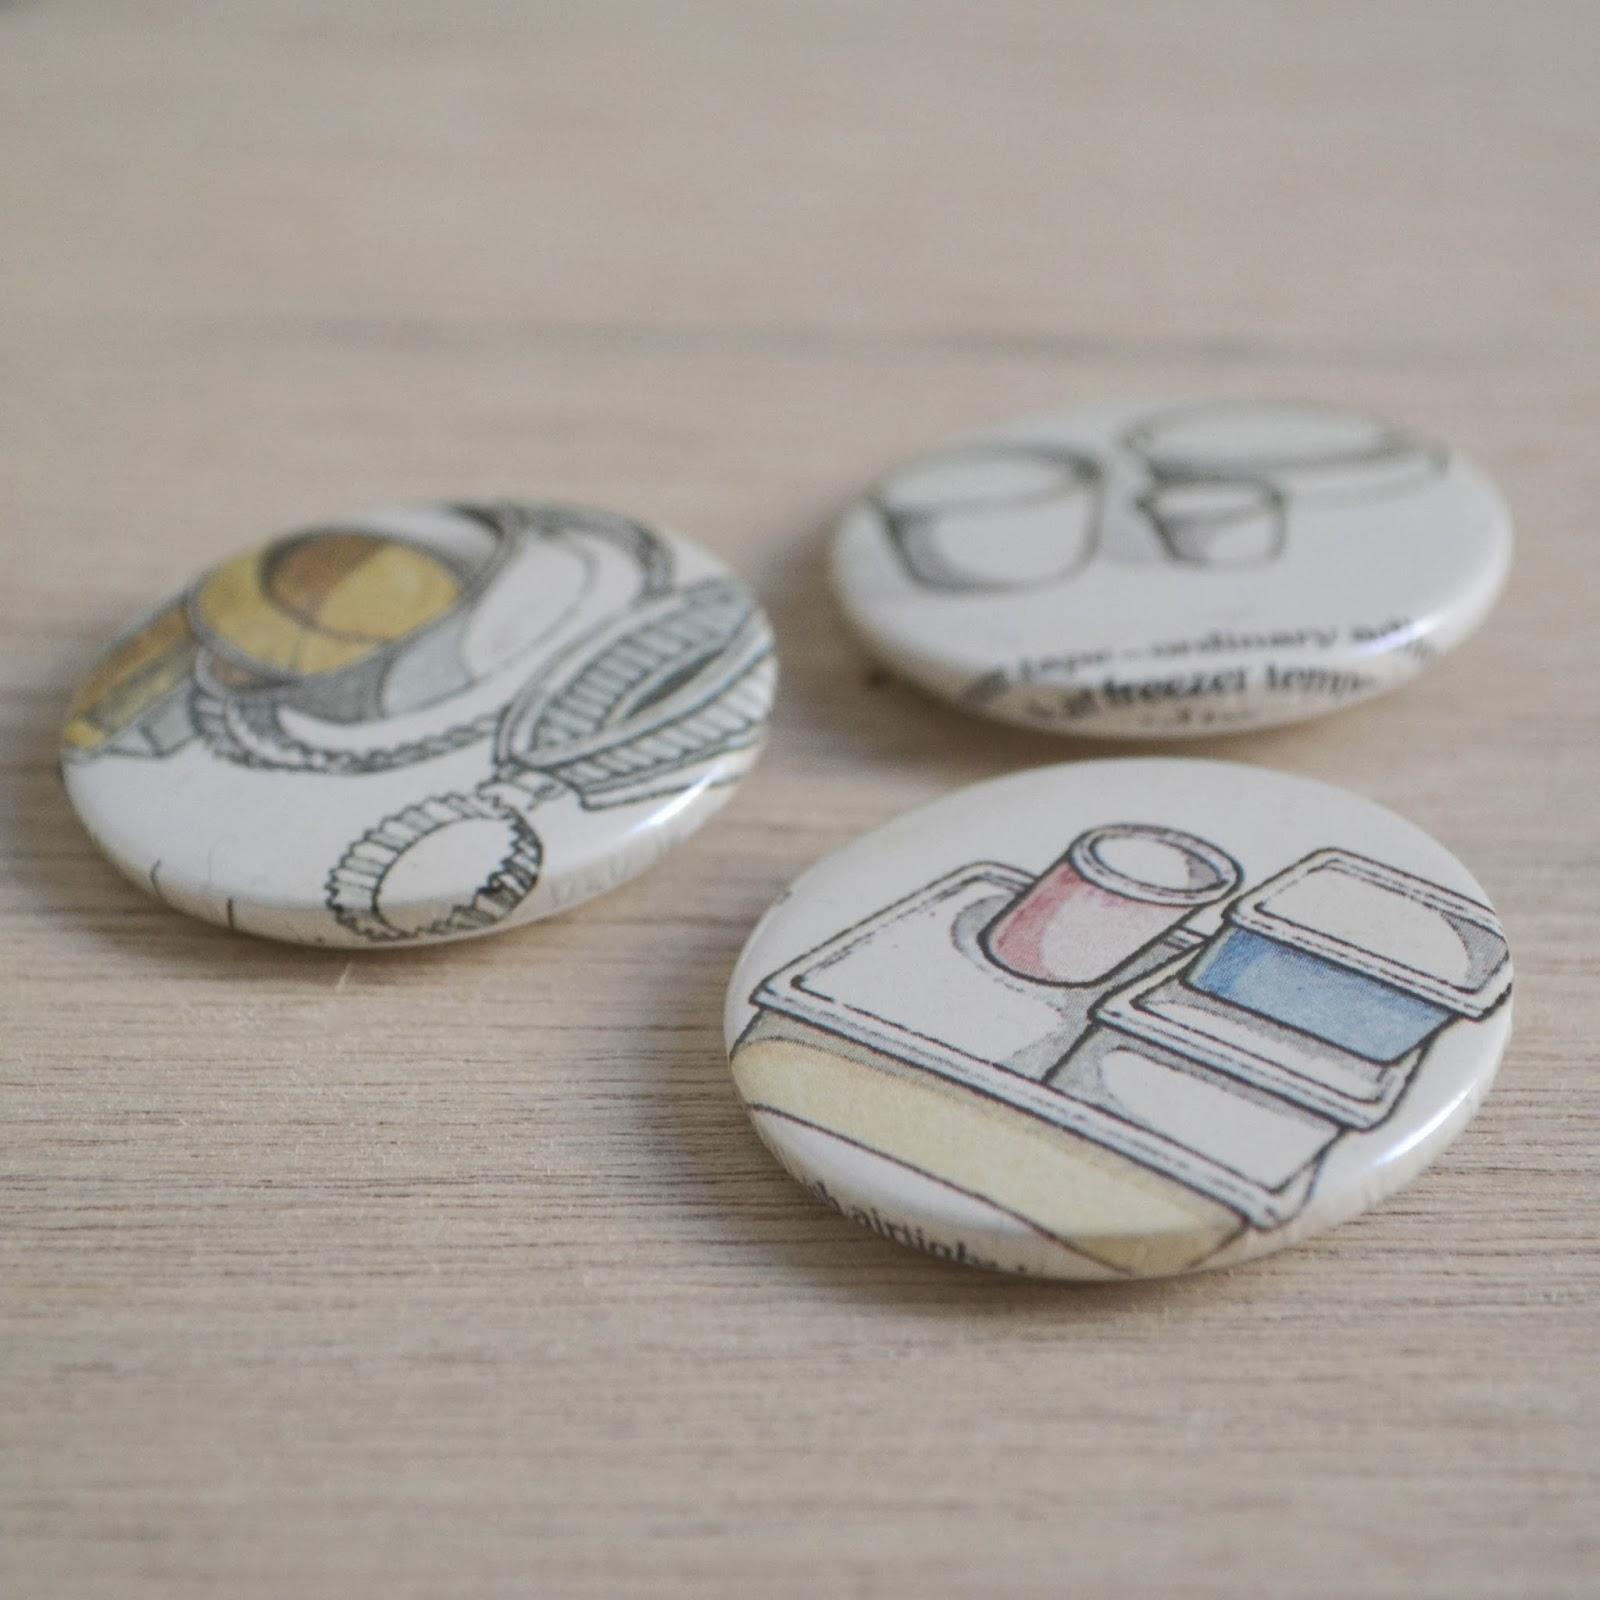 https://www.etsy.com/listing/175719206/vintage-cookery-book-badges?ref=shop_home_active_11